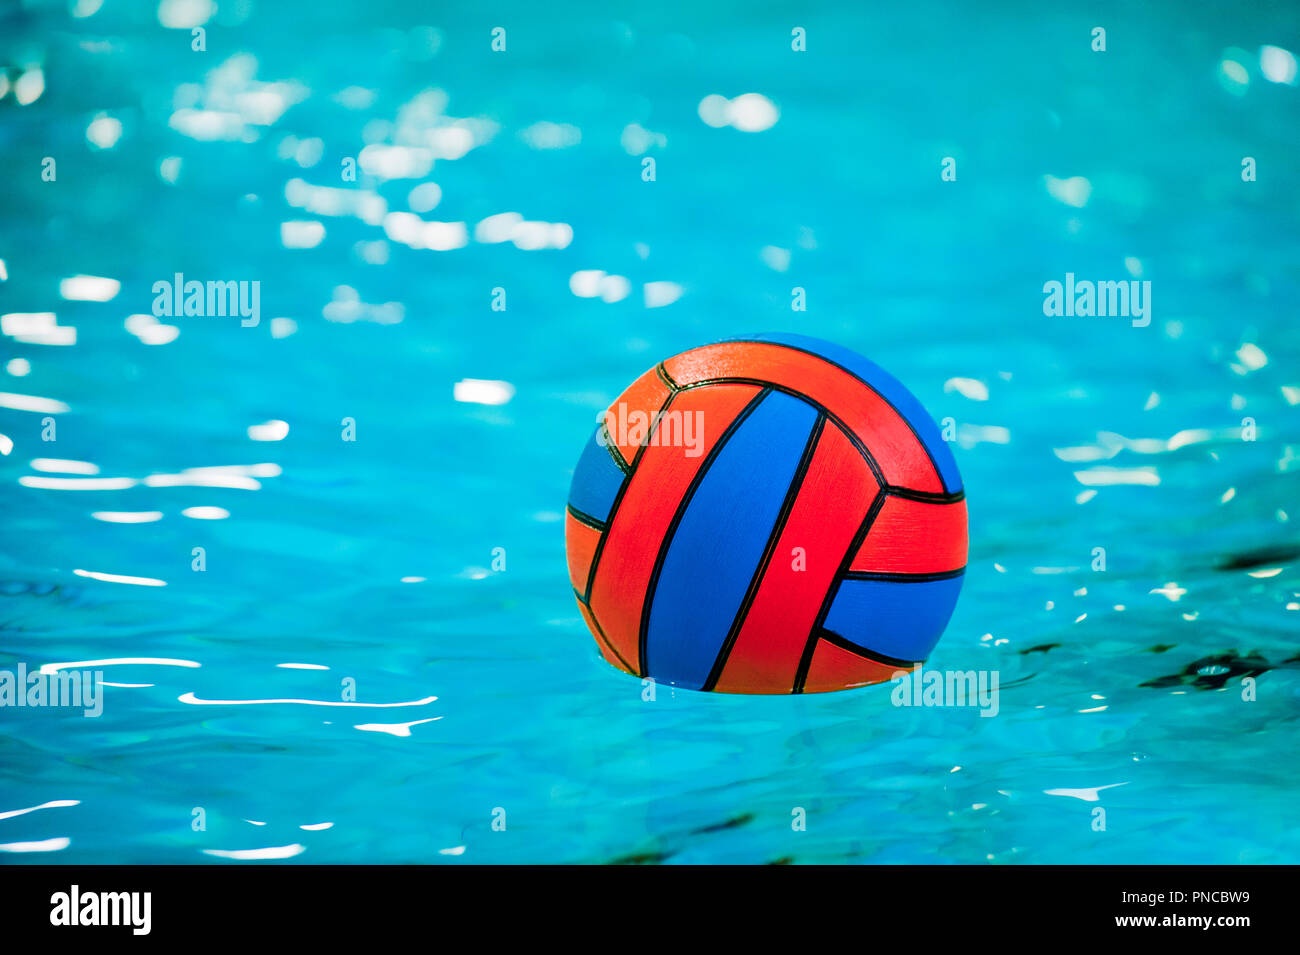 Fotos Alamy Polo Imágenes Stockamp; Water De qzUpGSMV